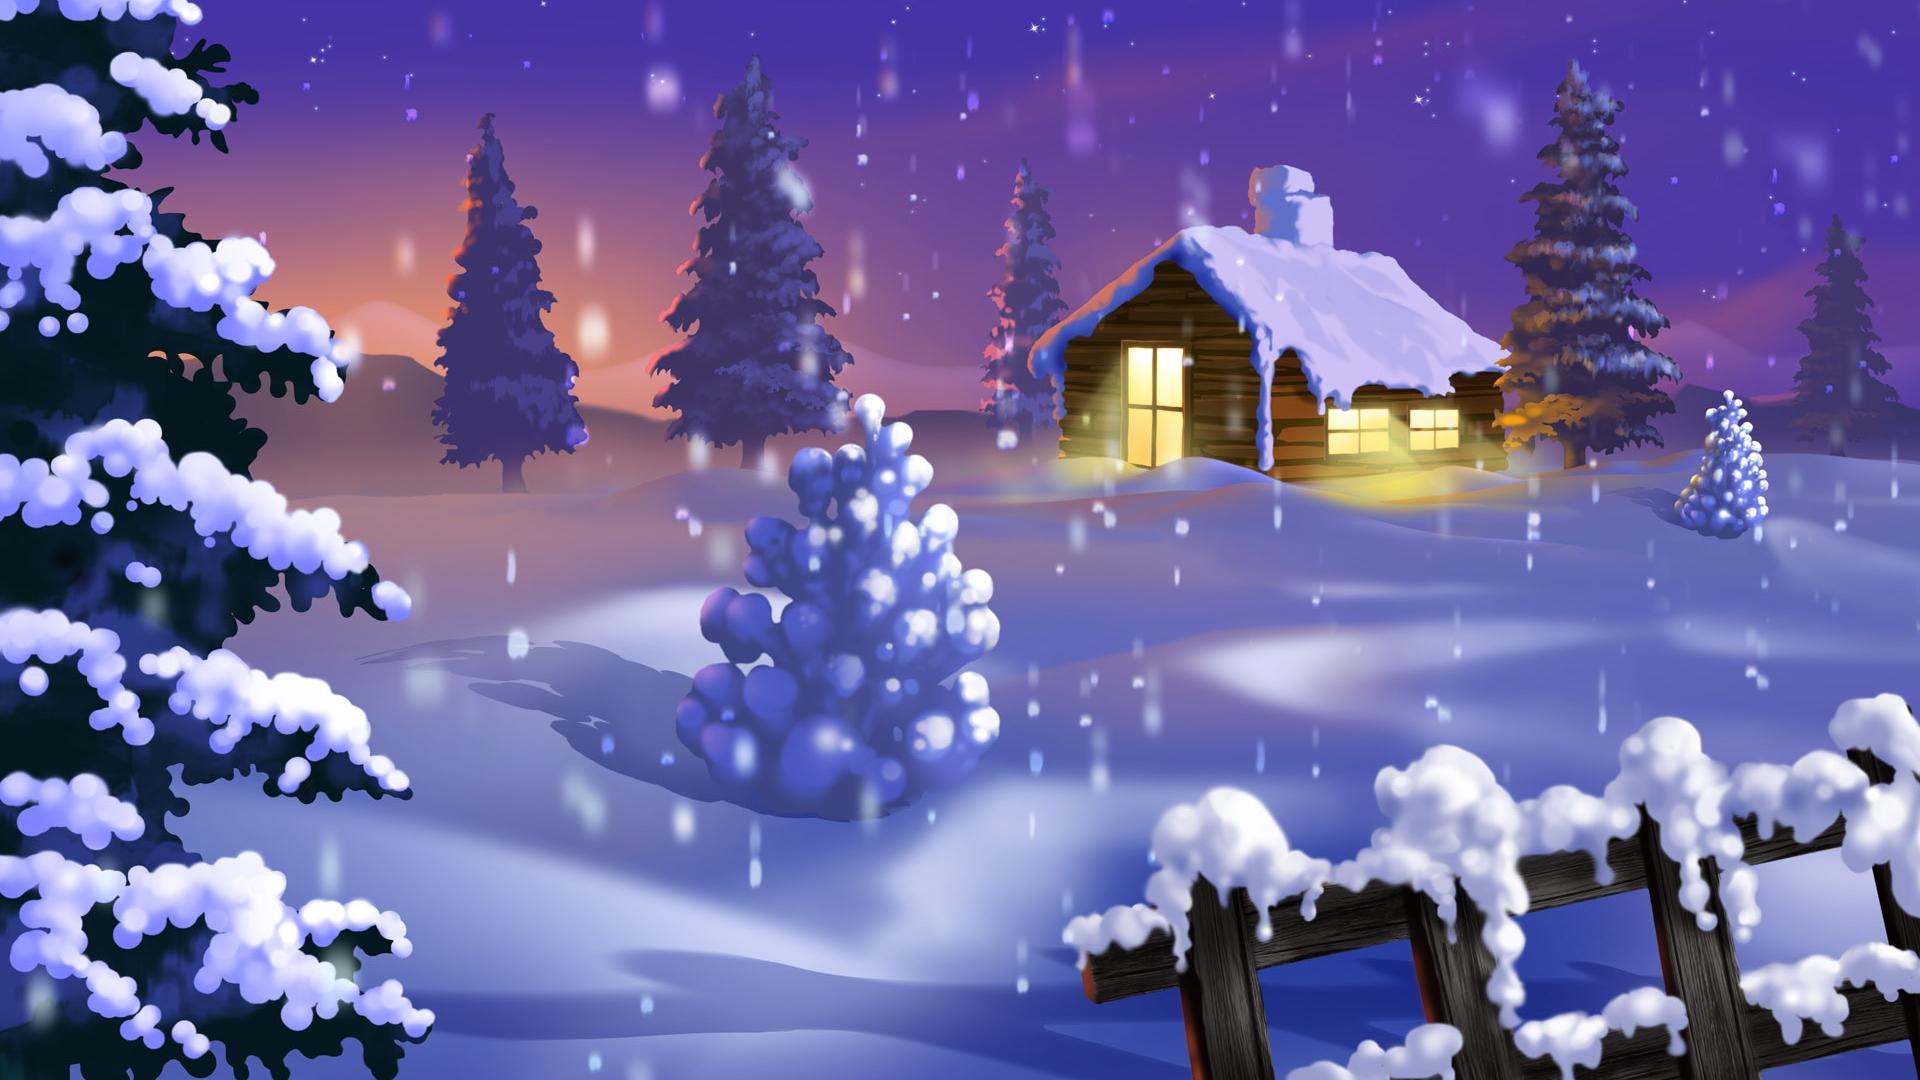 картинка 2019 домик зимой